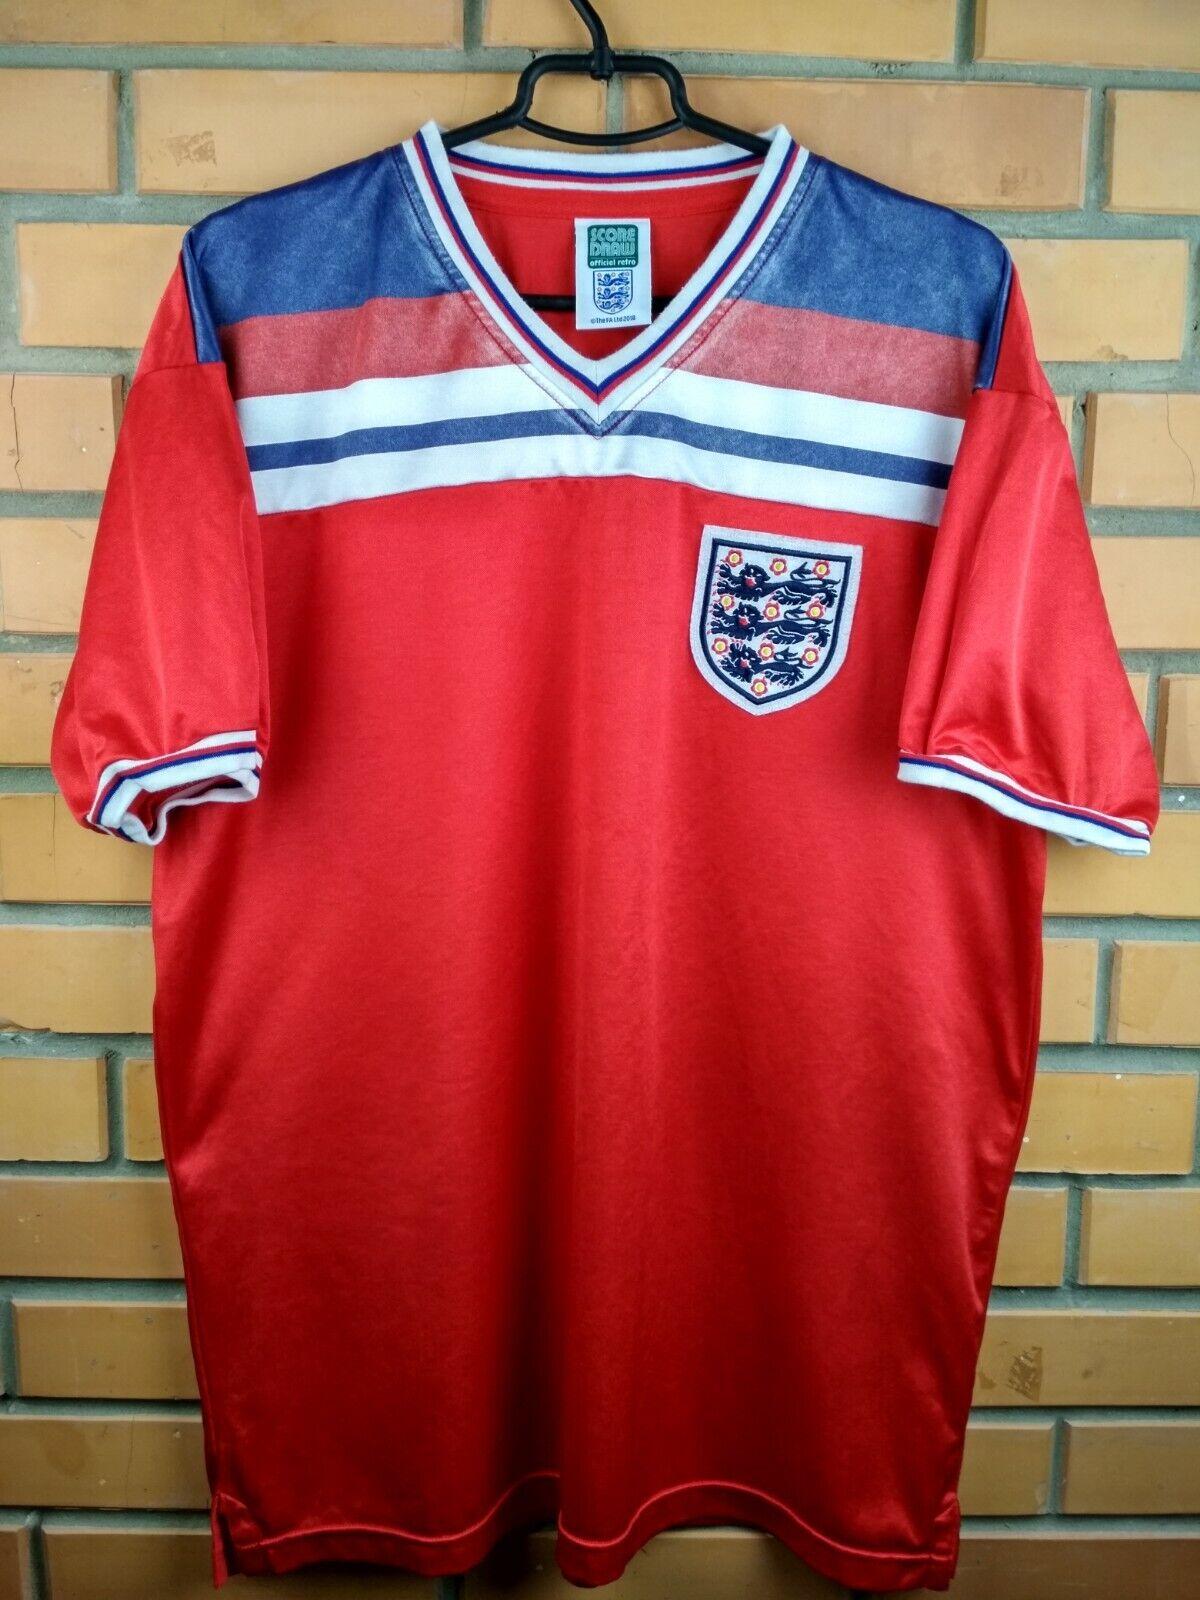 e7316dc1cd7 9.5 10 England soccer replica jersey XL 1980 1983 shirt away football Score  Draw